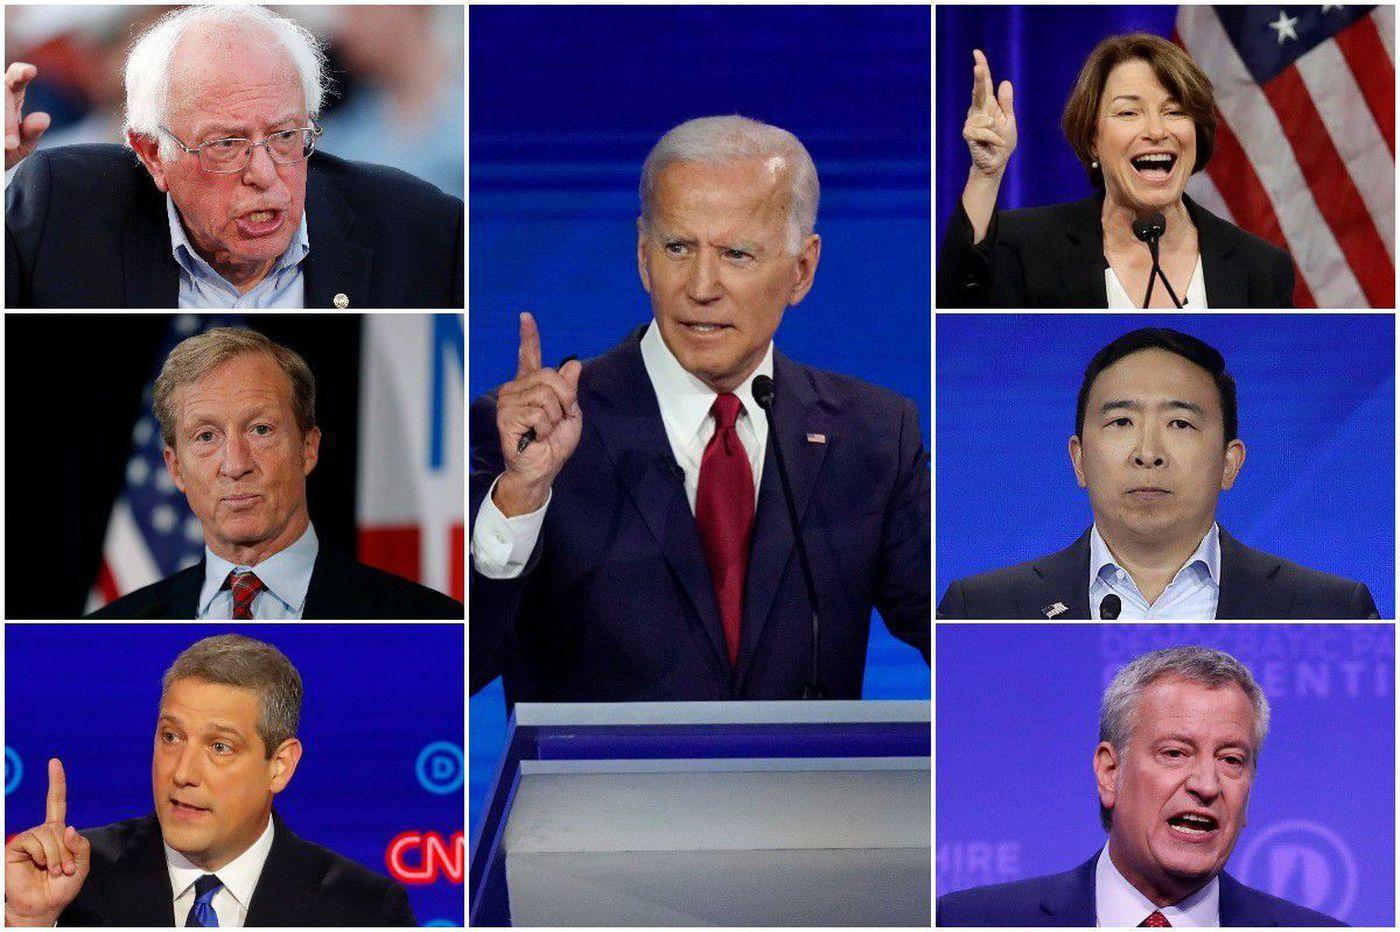 Joe Biden, Bernie Sanders to attend Democratic presidential labor forum in Philadelphia on Tuesday